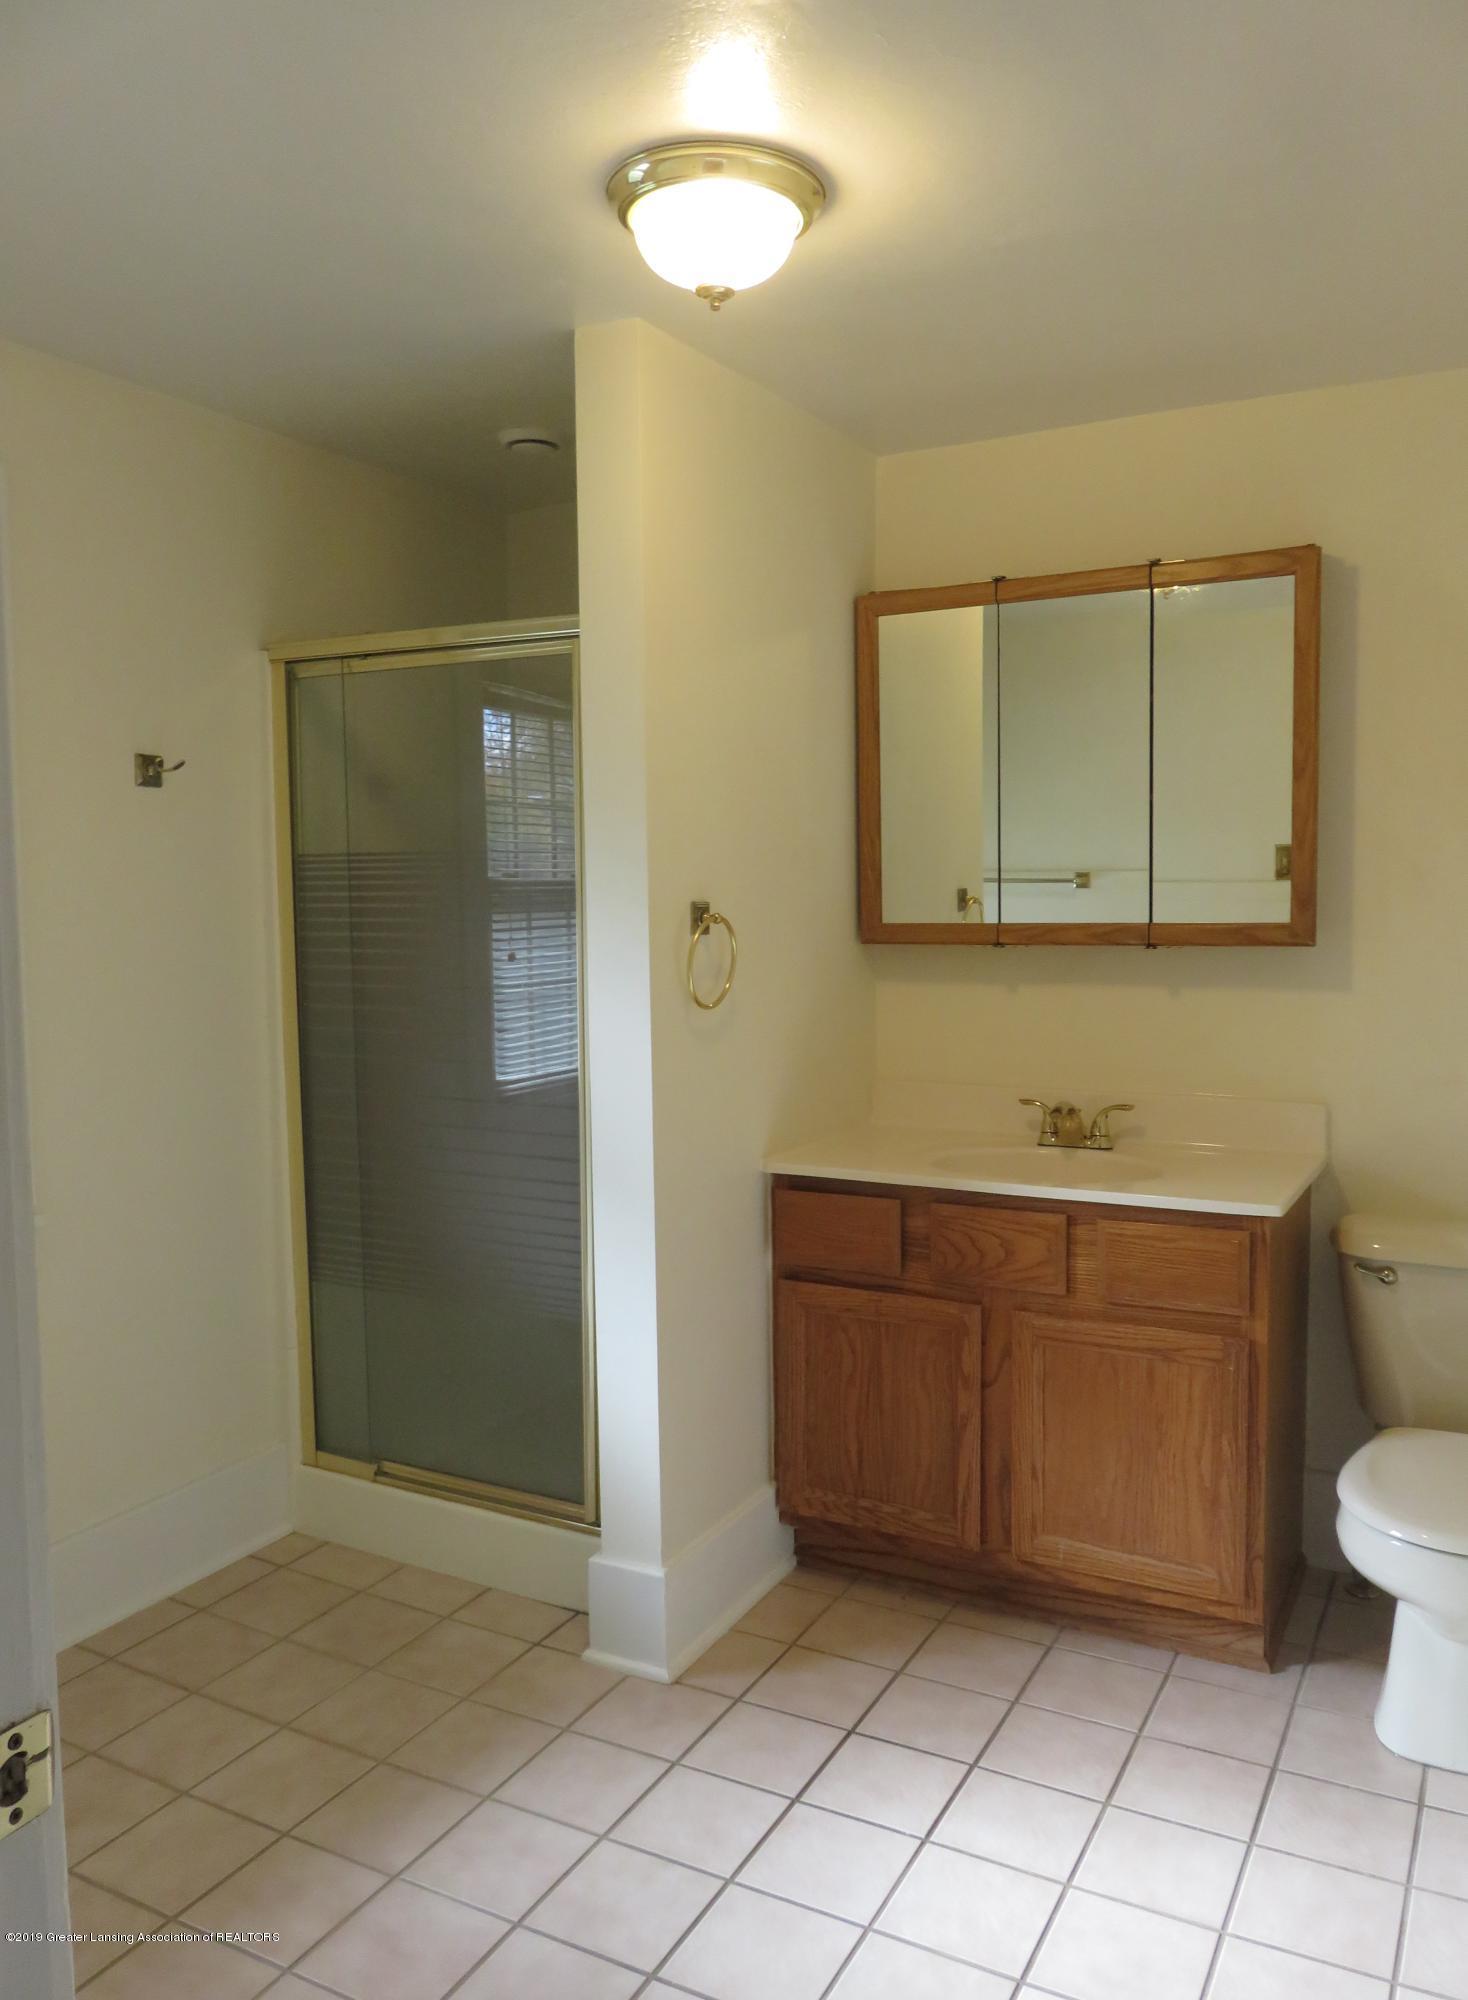 611 N Francis Ave - Very Large Bathroom - 13